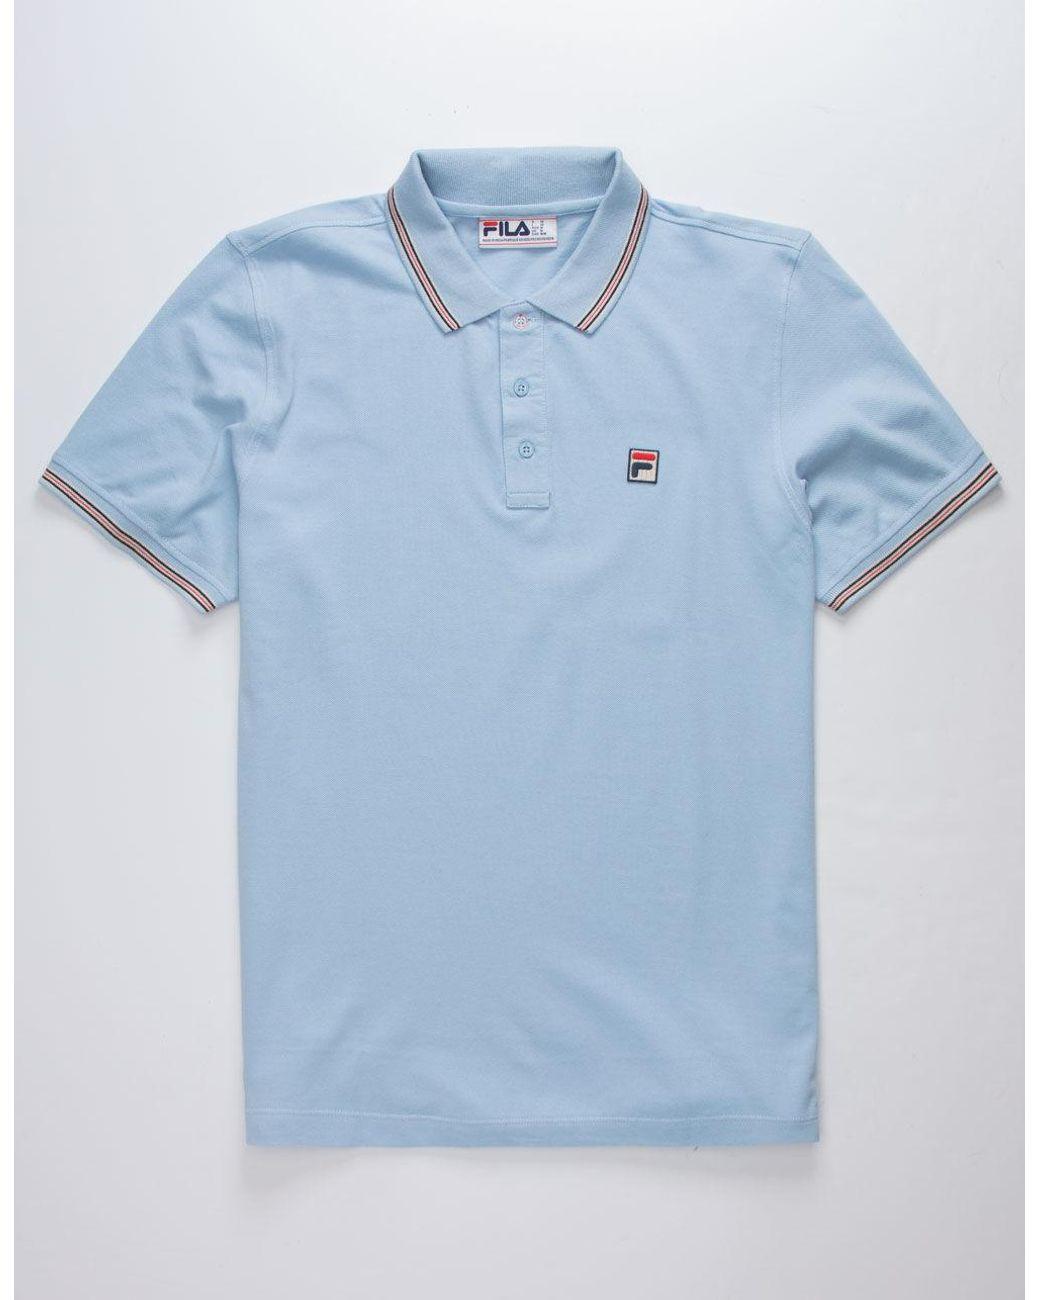 Matcha 3 Light Blue Mens Polo Shirt